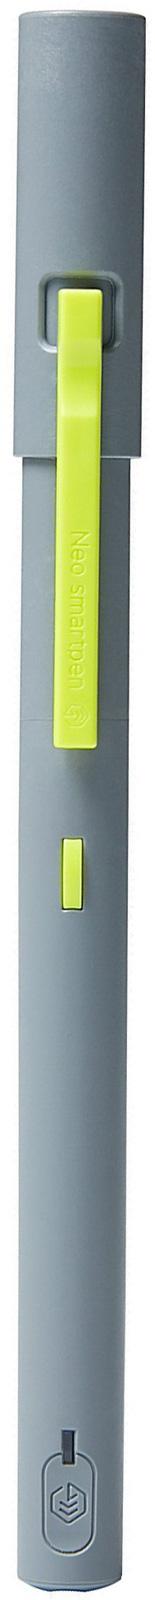 Графический планшет Neolab Neo SmartPen M1, Gray умная ручка neolab neo smartpen m1 grey nwp f50g